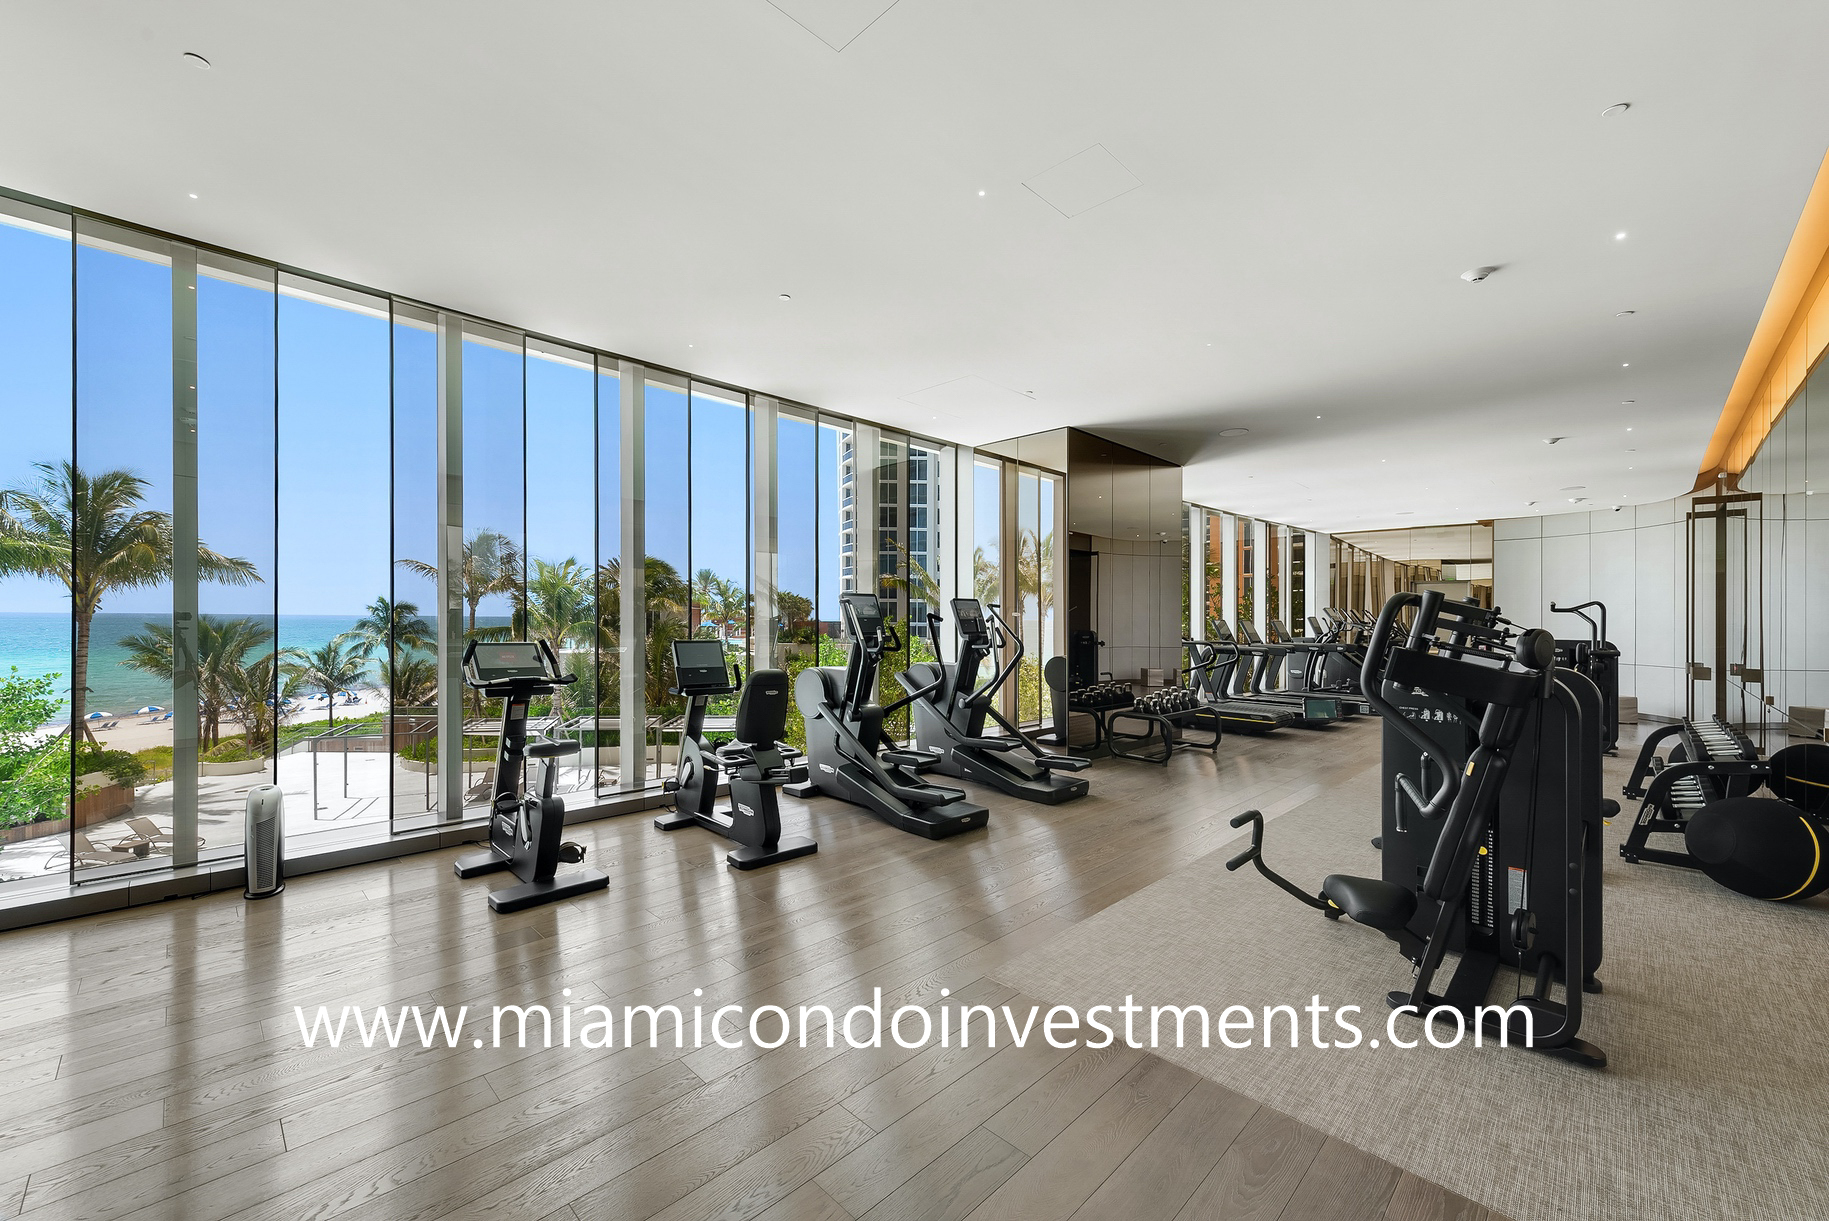 Armani Casa fitness center